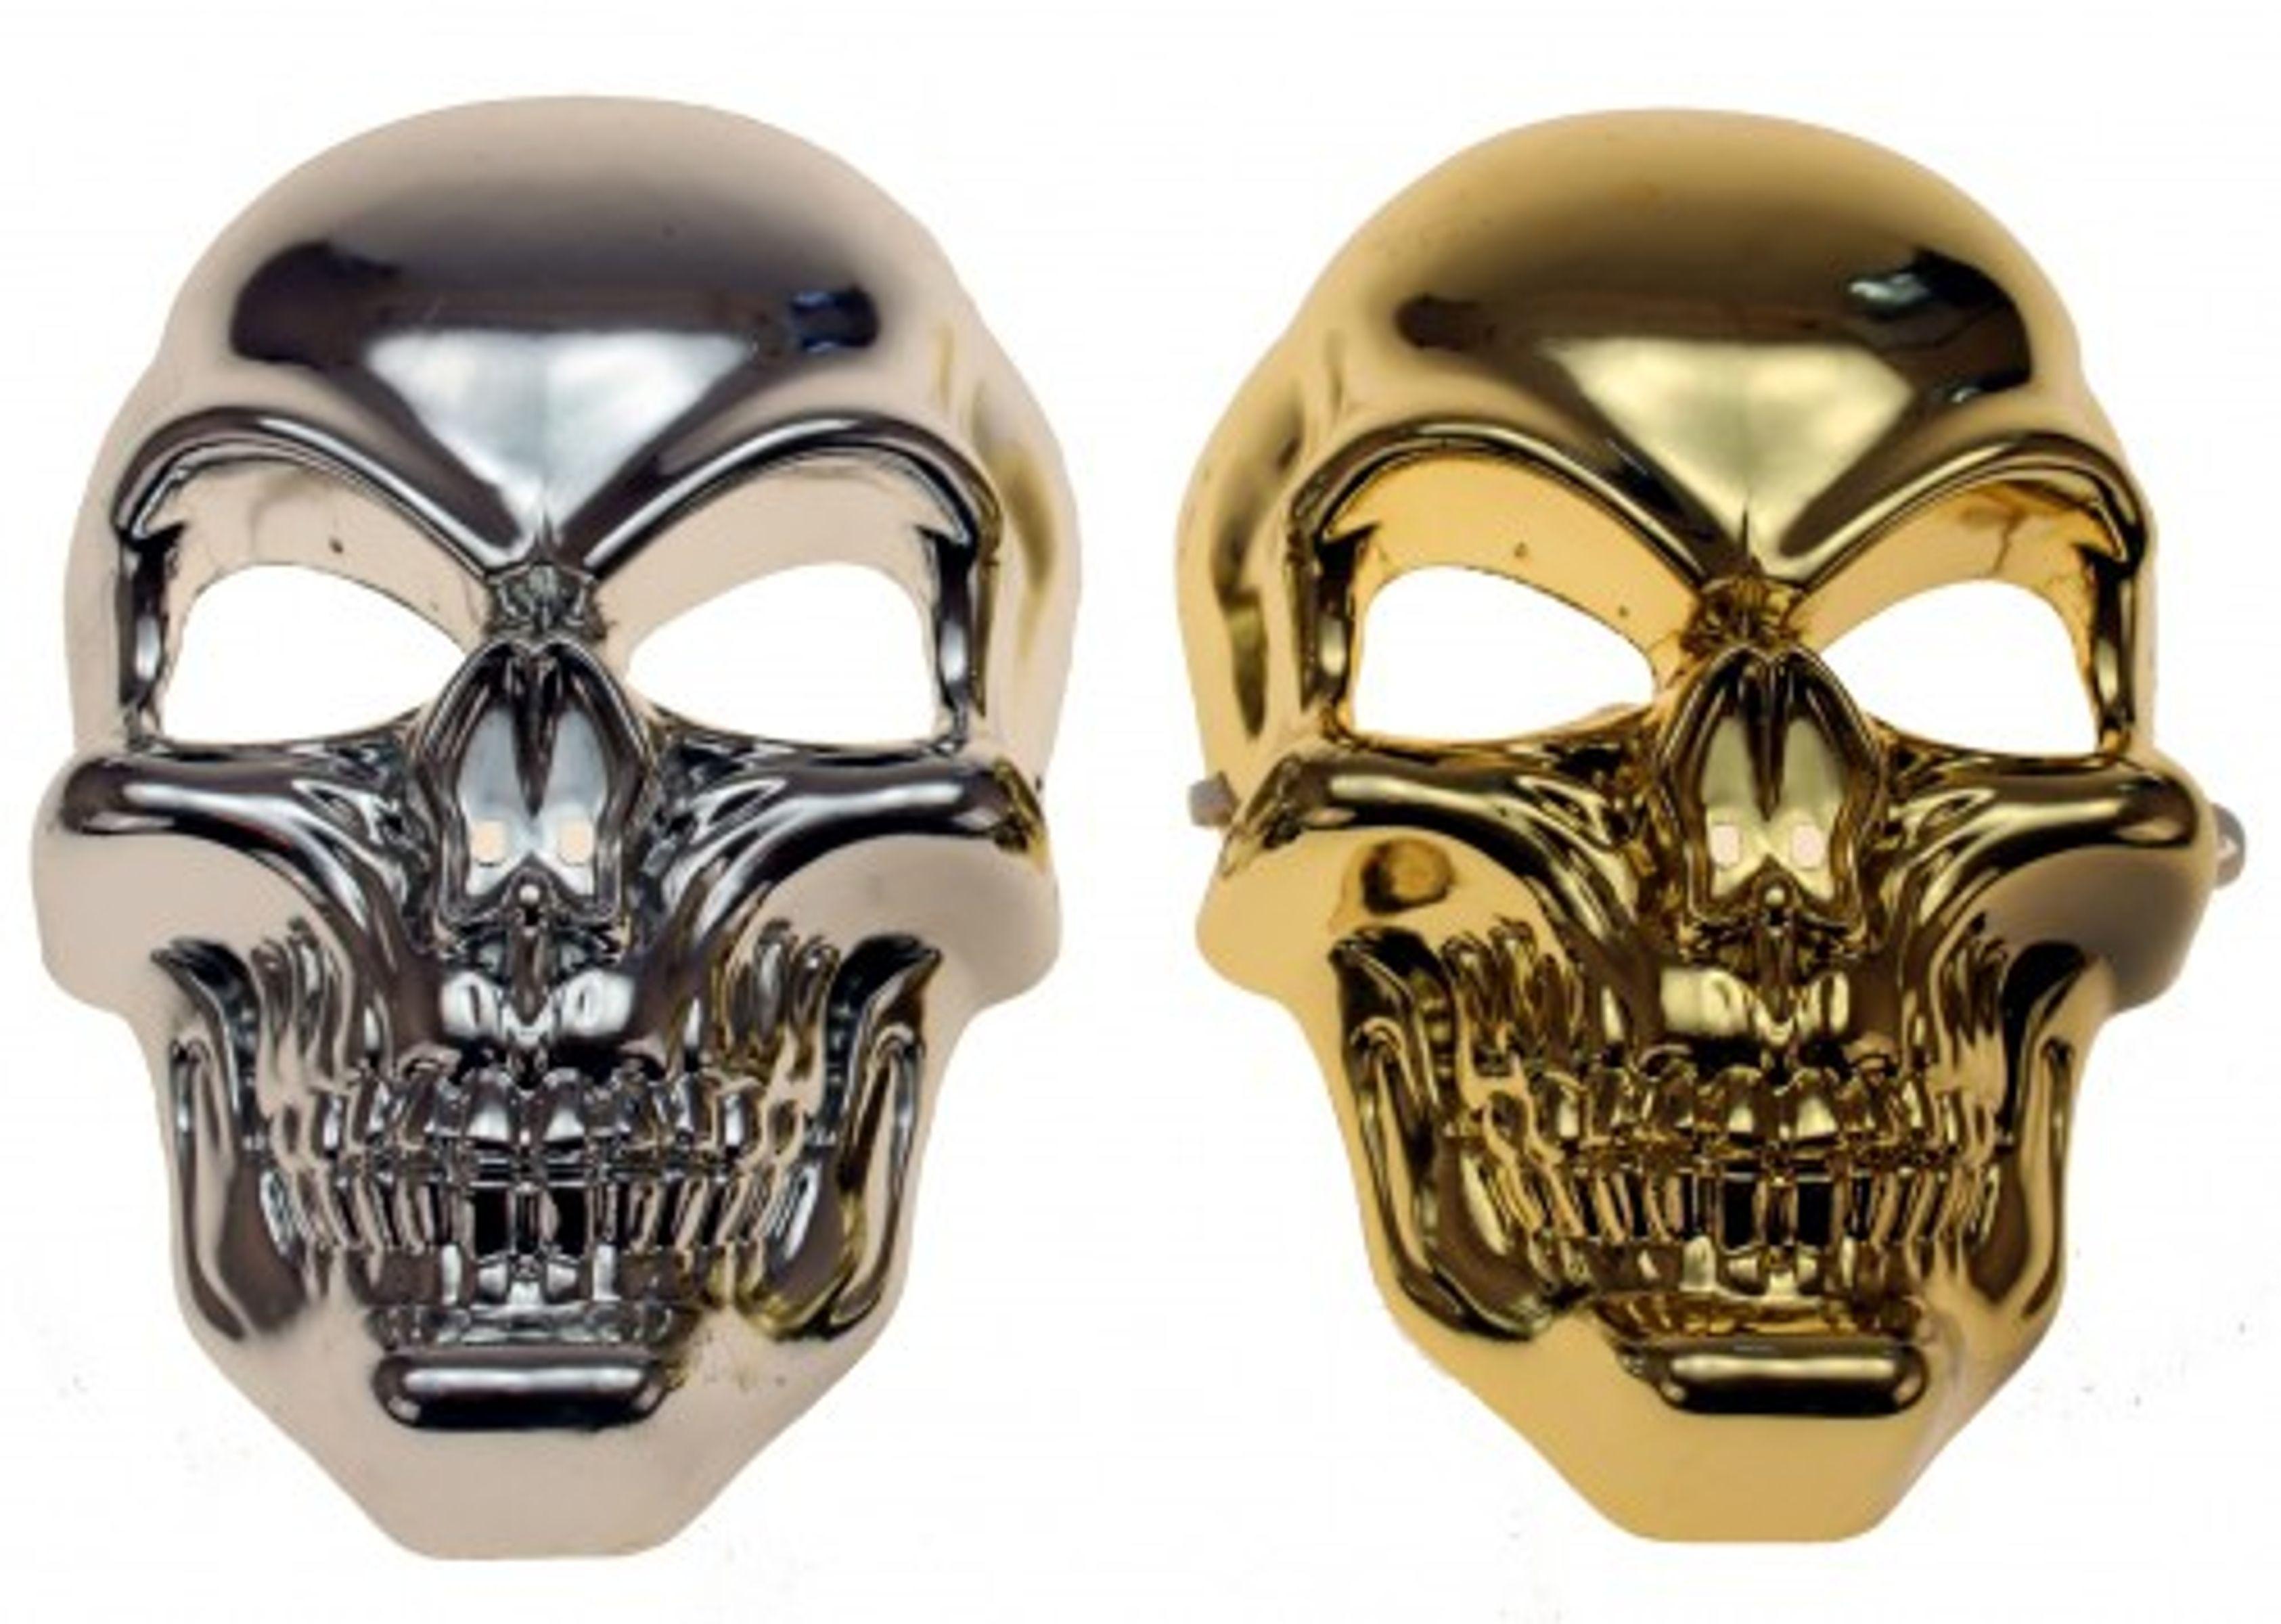 totenkopfmaske totenkopf maske sch del skelett halloween karneval kost m haushaltswaren m bel. Black Bedroom Furniture Sets. Home Design Ideas